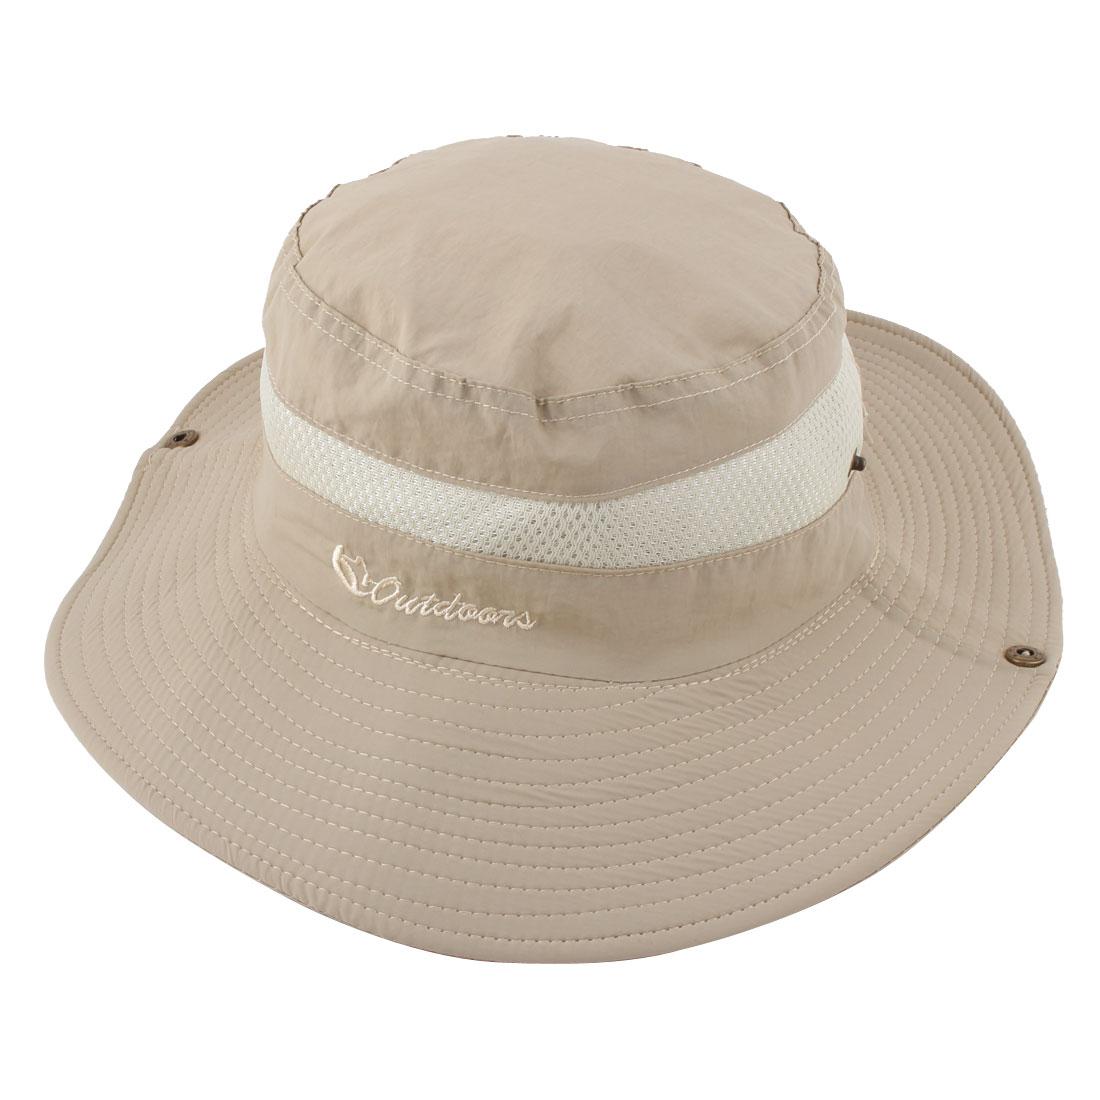 Fisherman Outdoor Hiking Hunting Travel Fishing Bucket Picnic Adjustable Mesh Wide Brim Cap Hat Beige